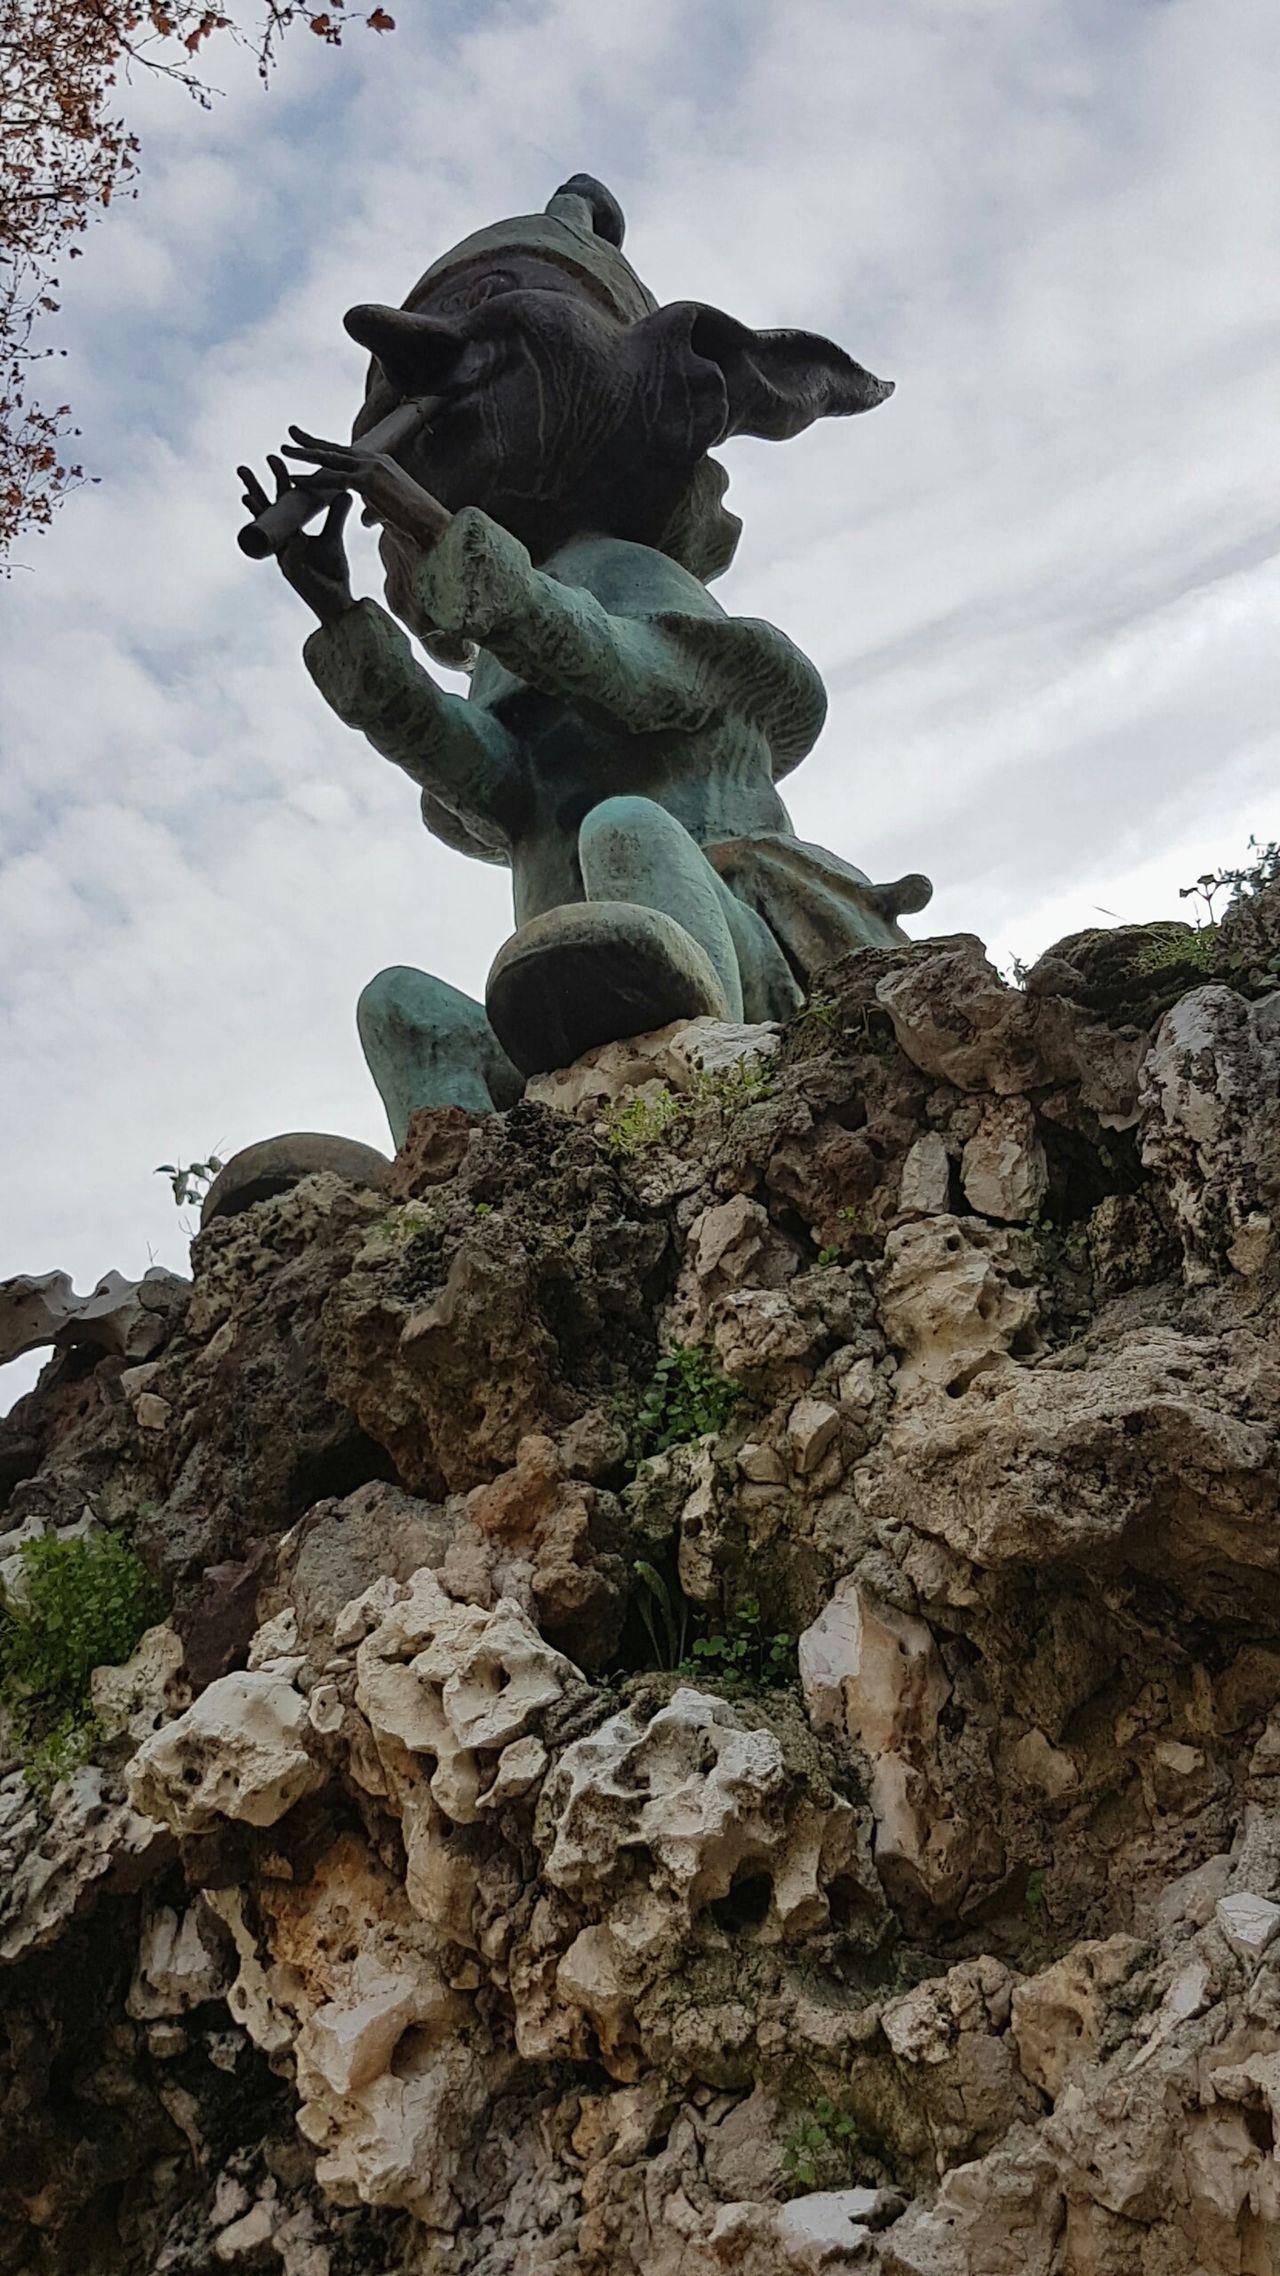 Travel Landscape Rock - Object Nature Cloud - Sky No People Sky Outdoors Day Sculpture Statue Elf El Retiro Park El Retiro